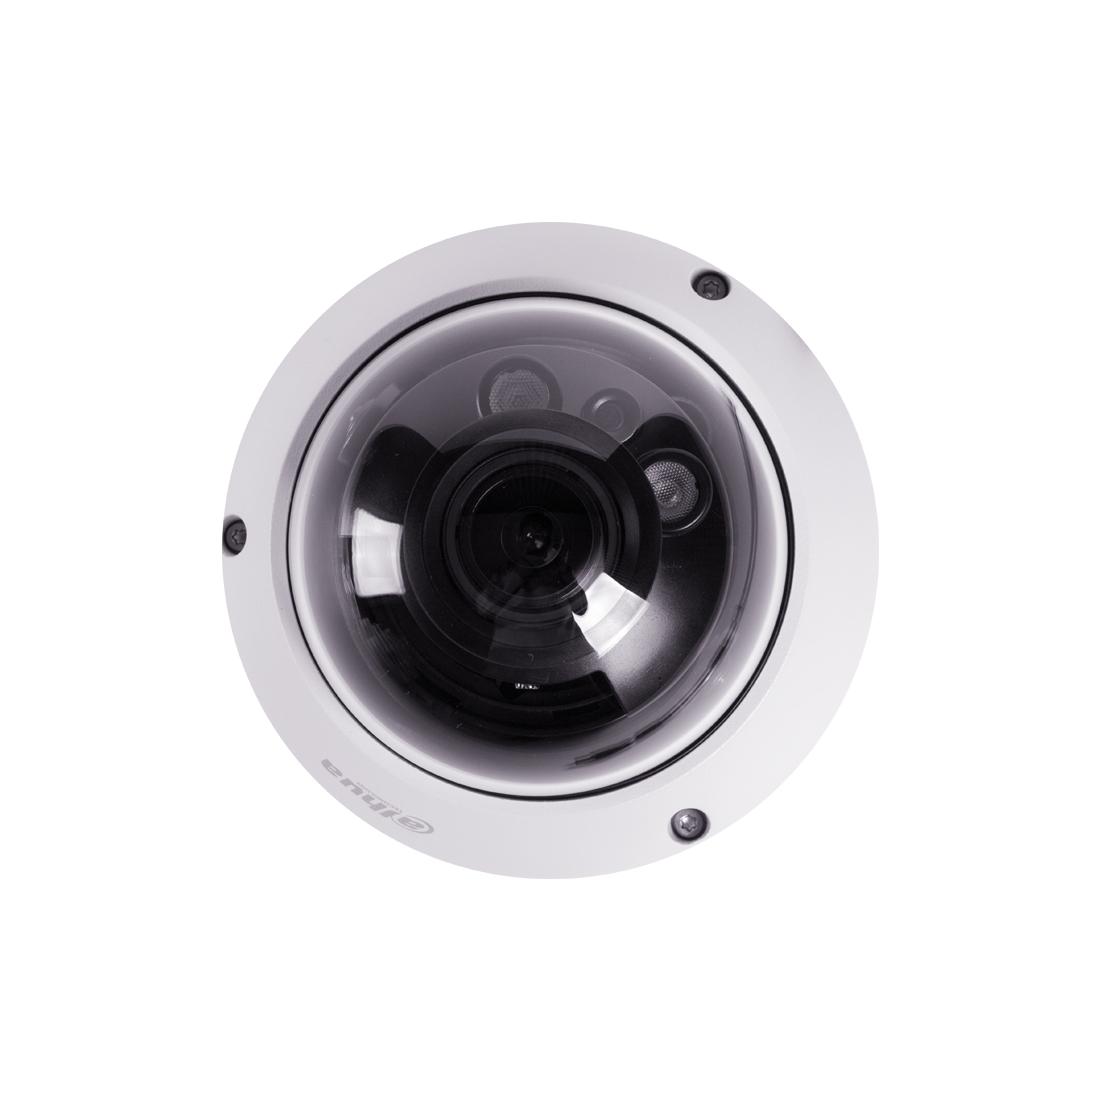 Купольная видеокамера Dahua DH-HAC-HDBW1200RP-VF